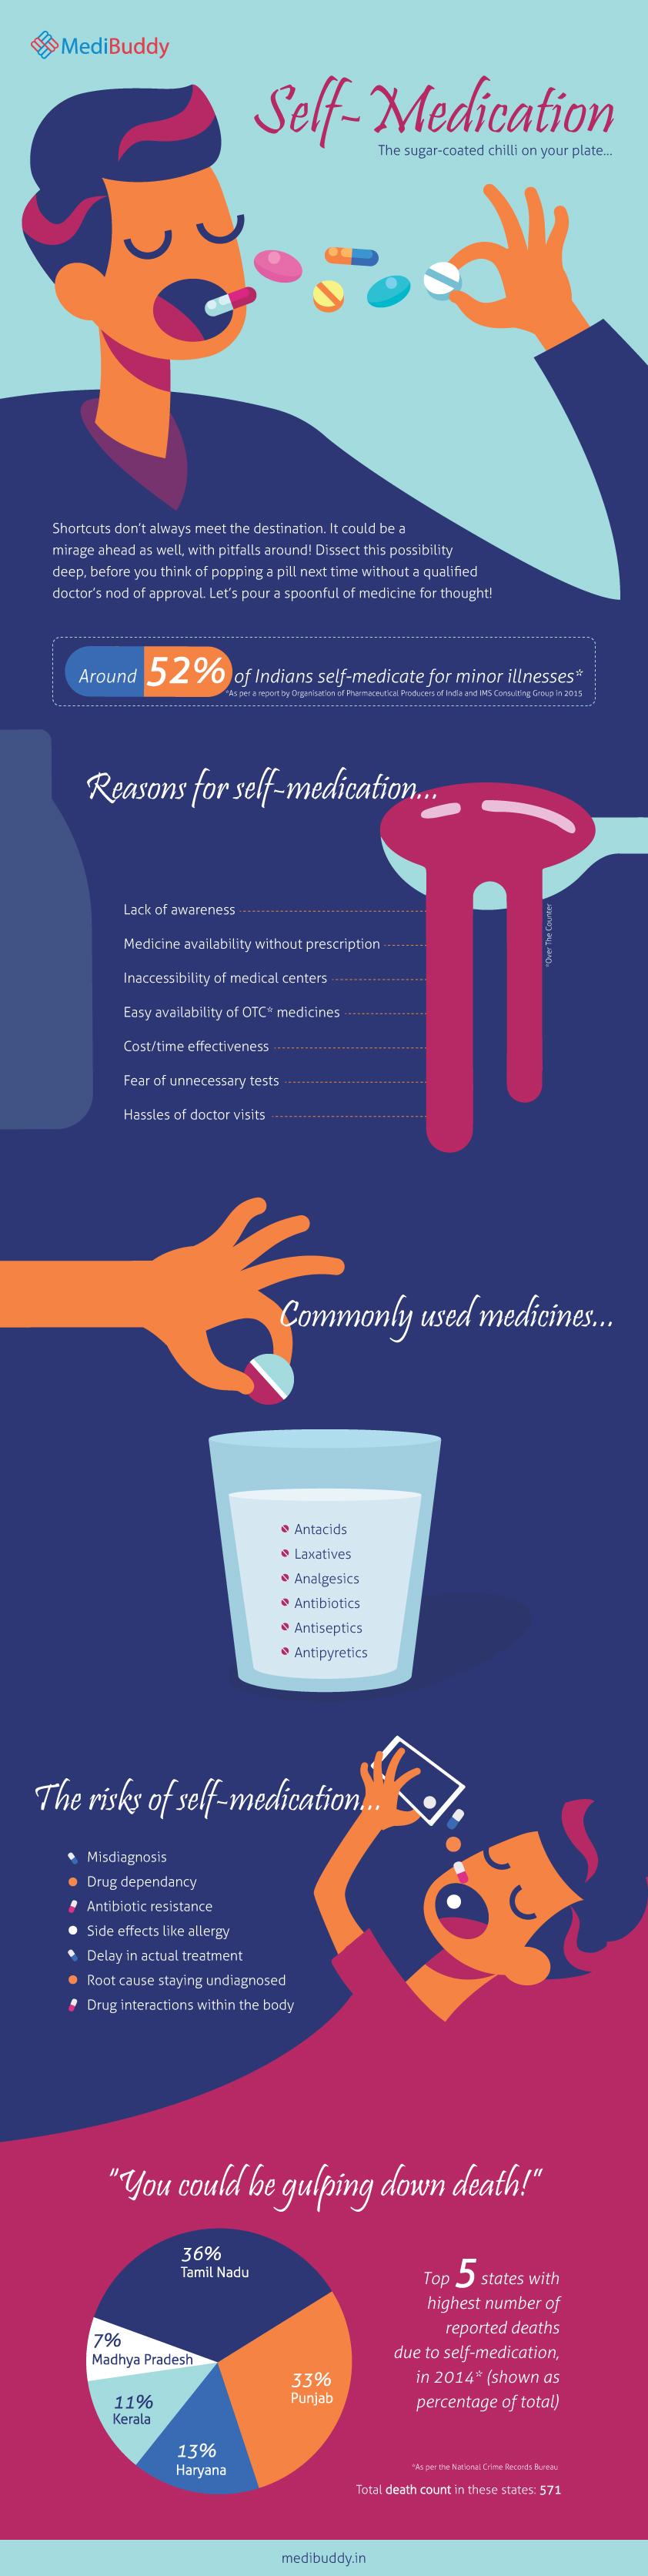 Self medication: Advantages and risks